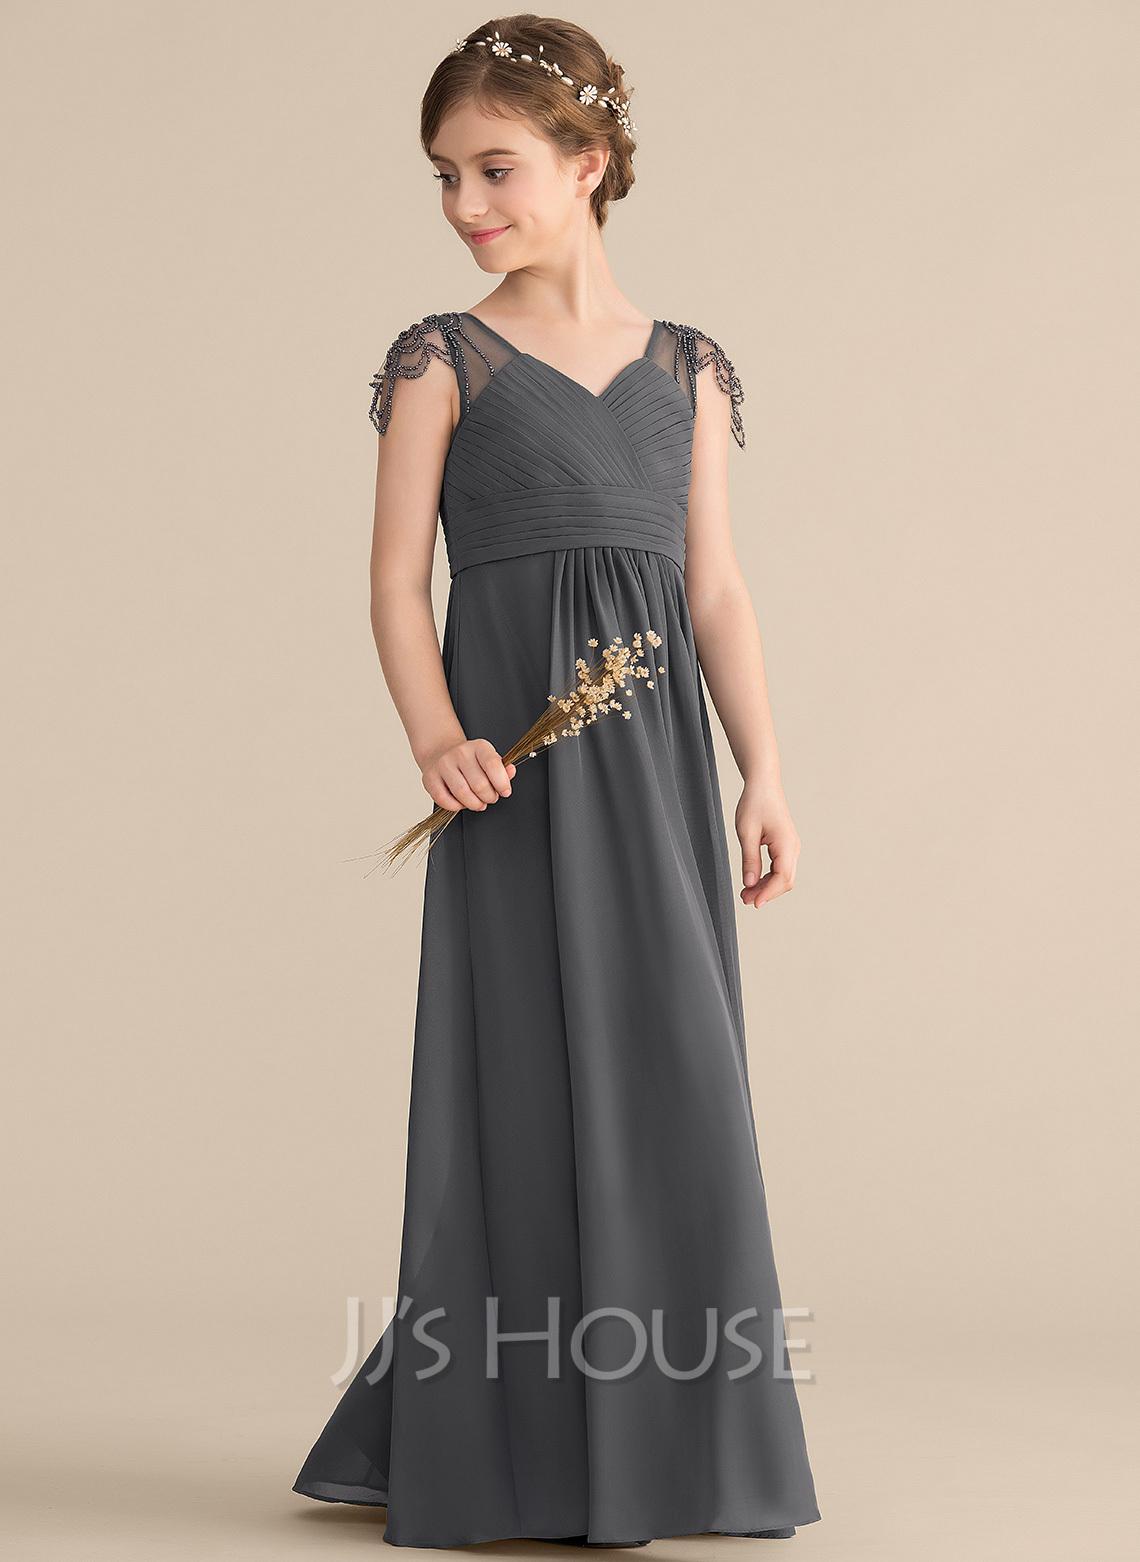 A-Line V-neck Floor-Length Chiffon Junior Bridesmaid Dress With Ruffle Beading